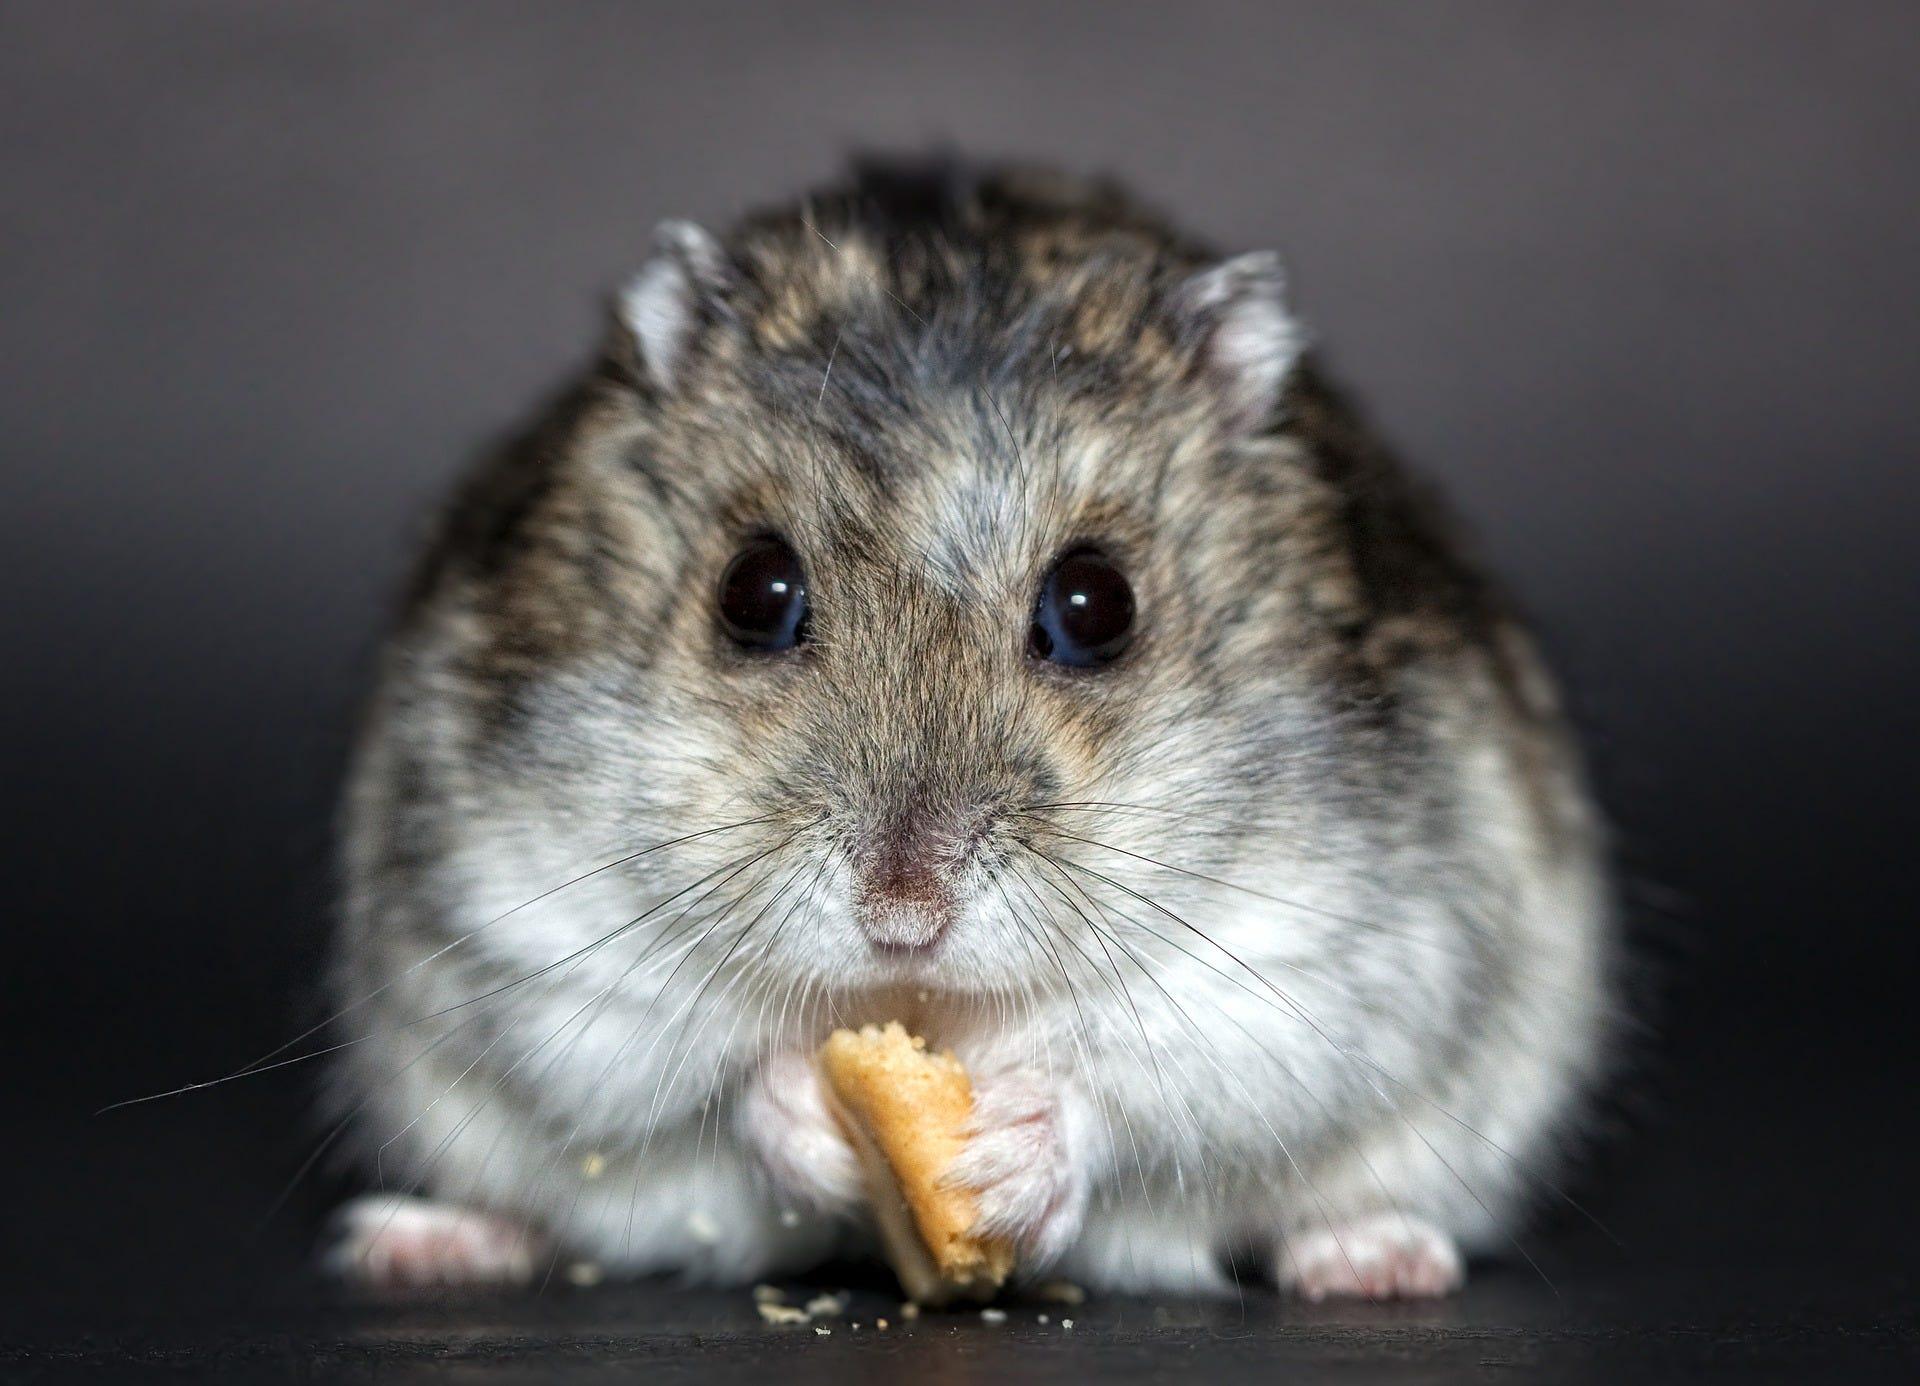 my hamster wheel is